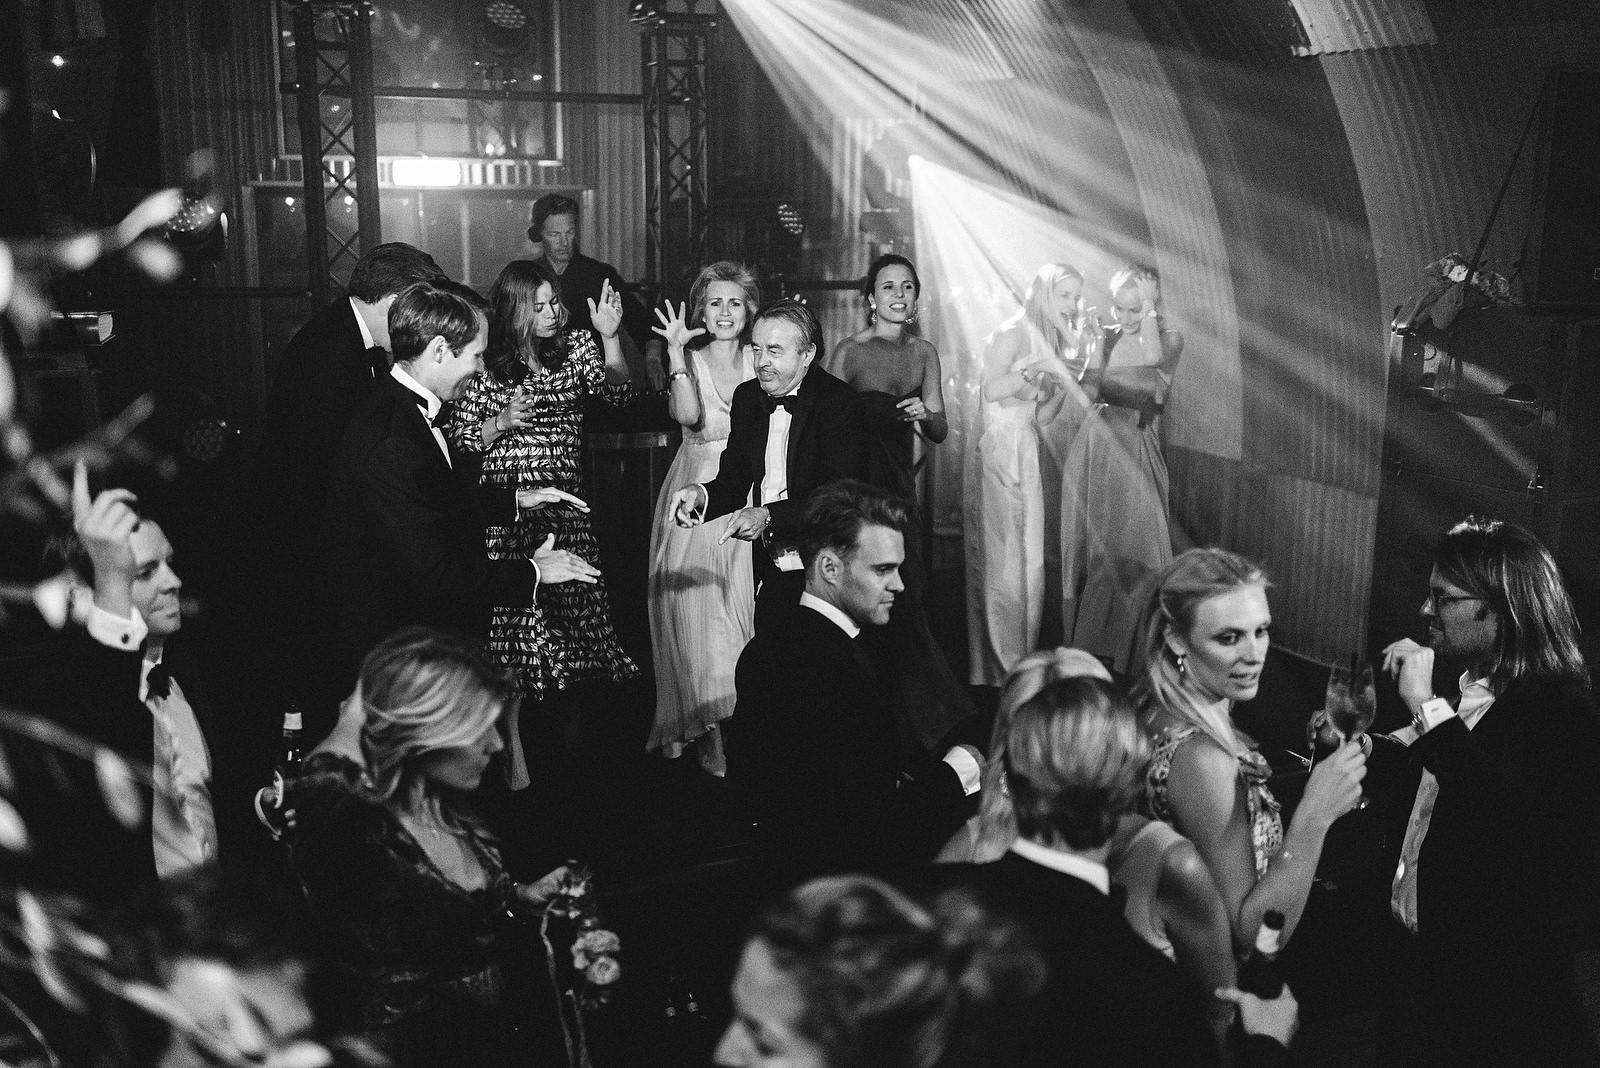 Fotograf Konstanz - Destination Wedding Photographer Amsterdam 138A - Destination Wedding Amsterdam  - 239 -